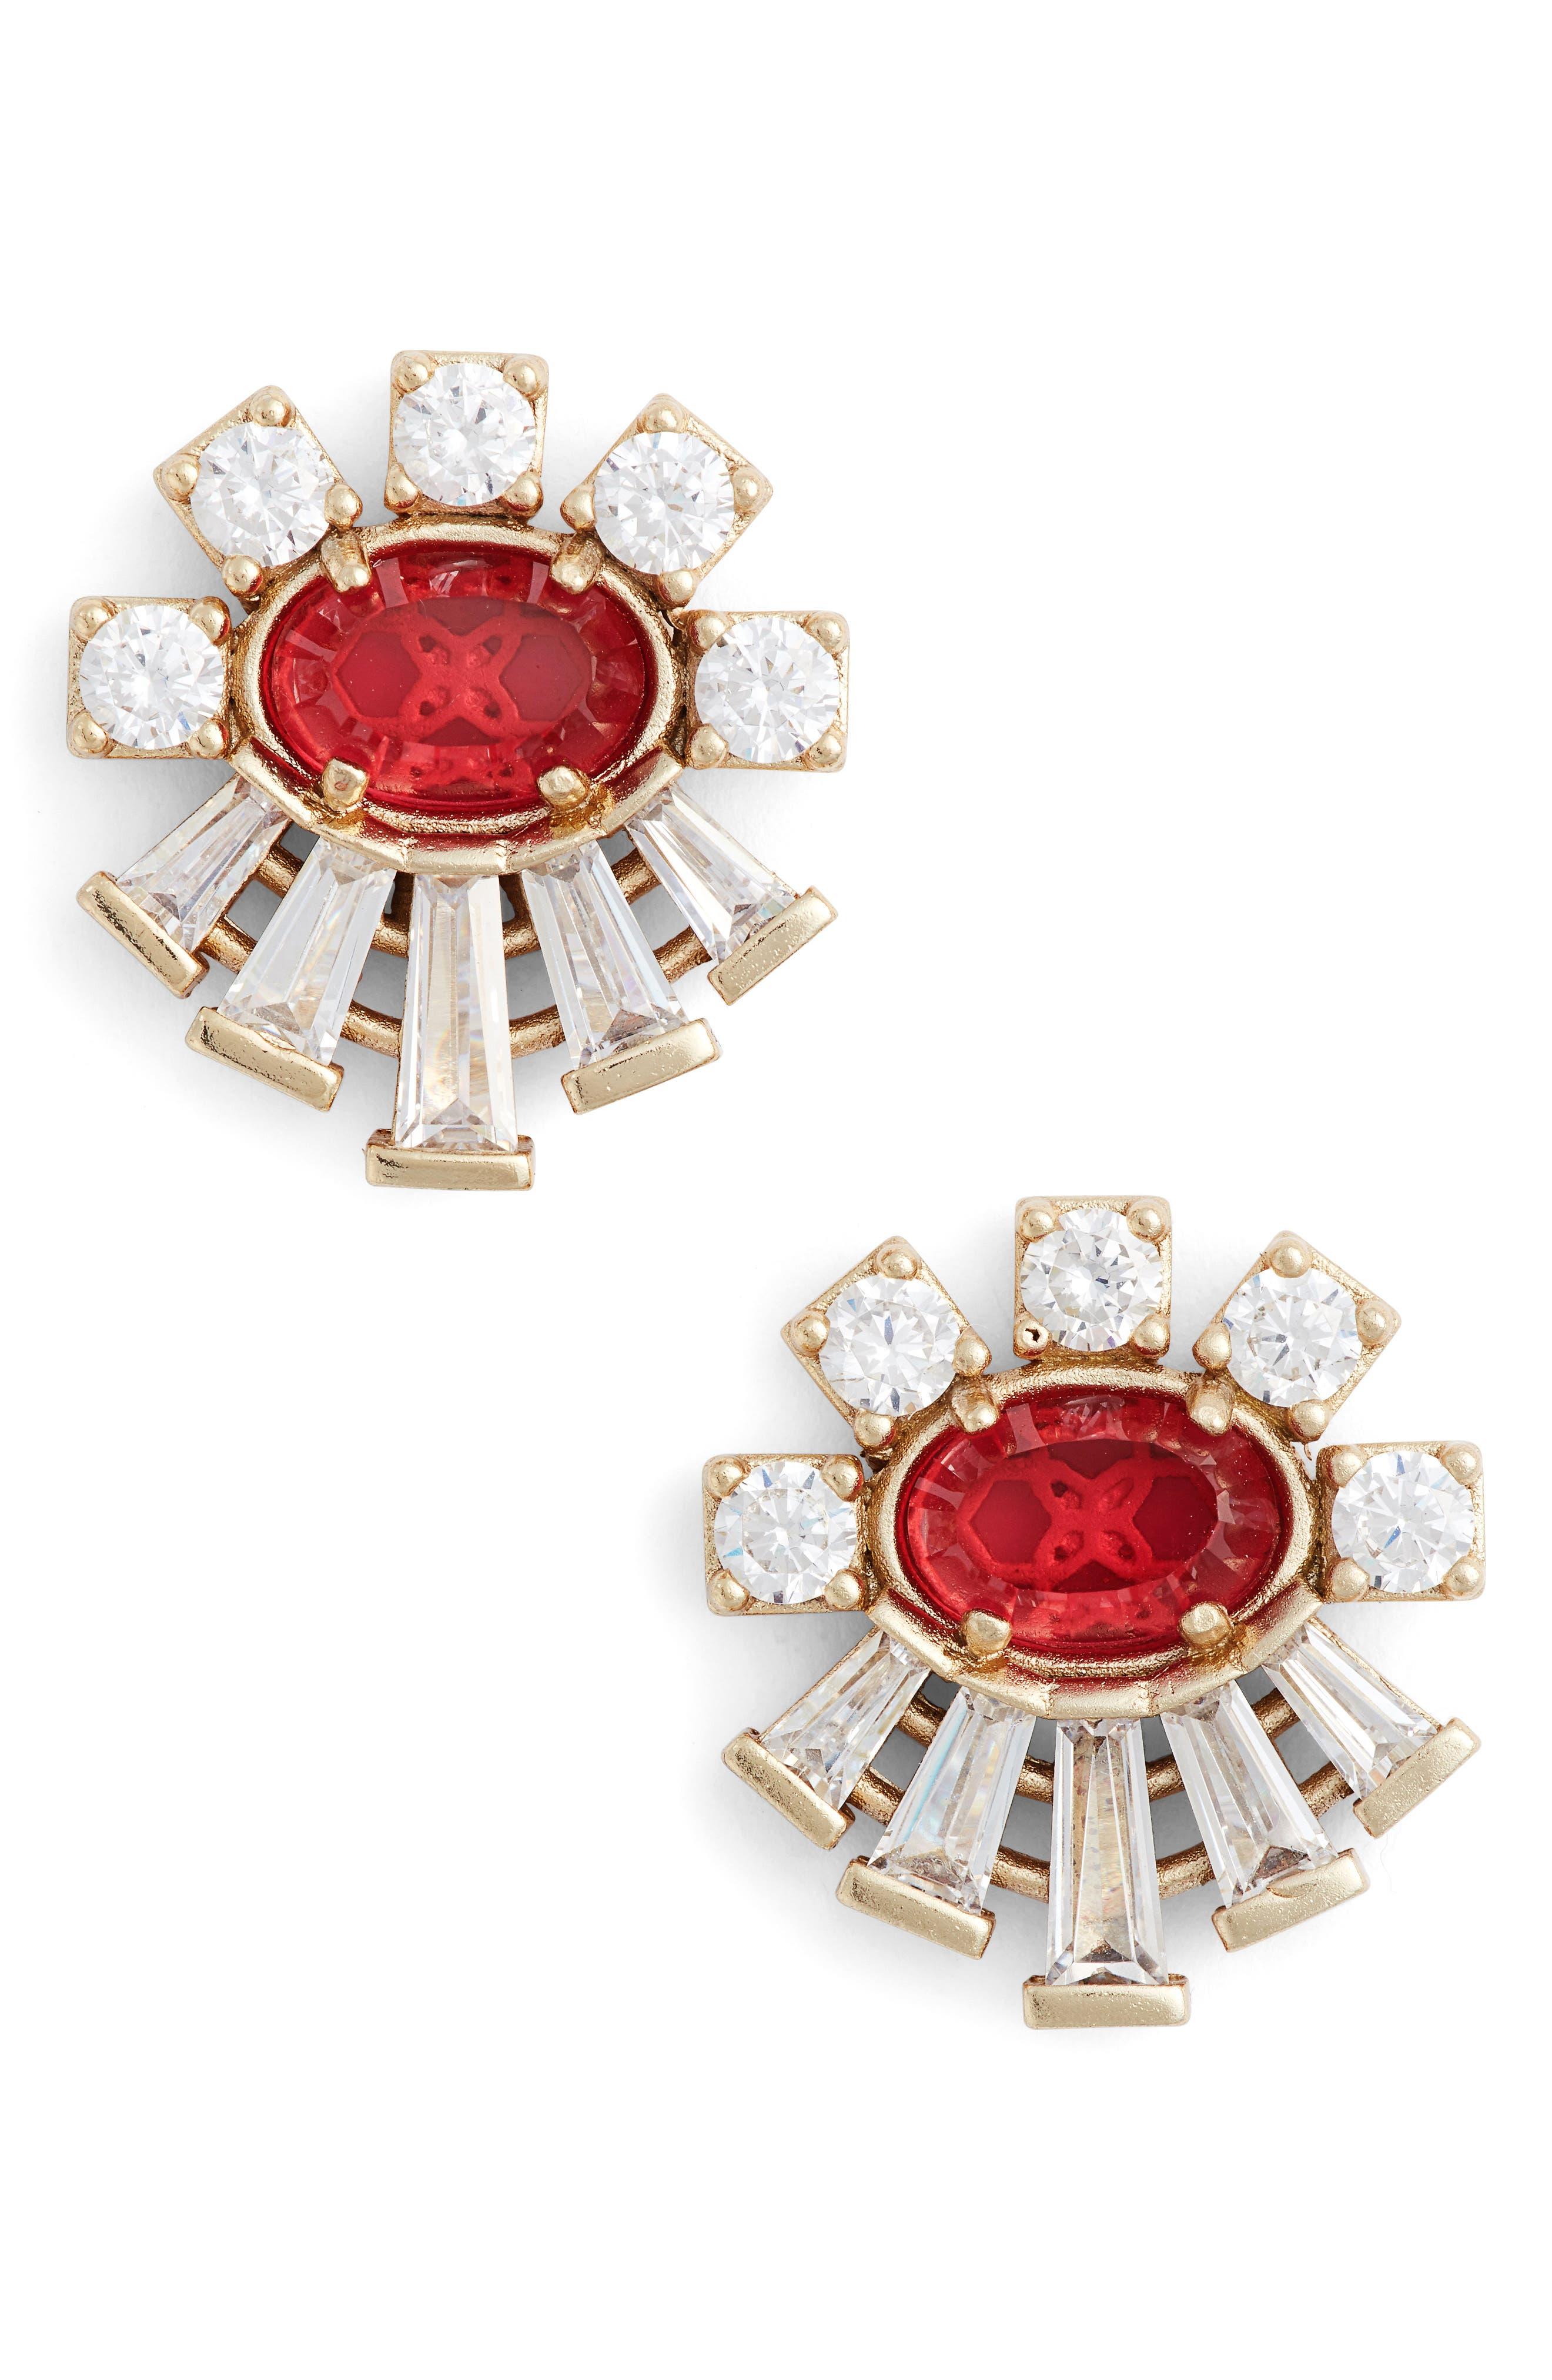 Kendra Scott Atticus Jewel Stud Earrings